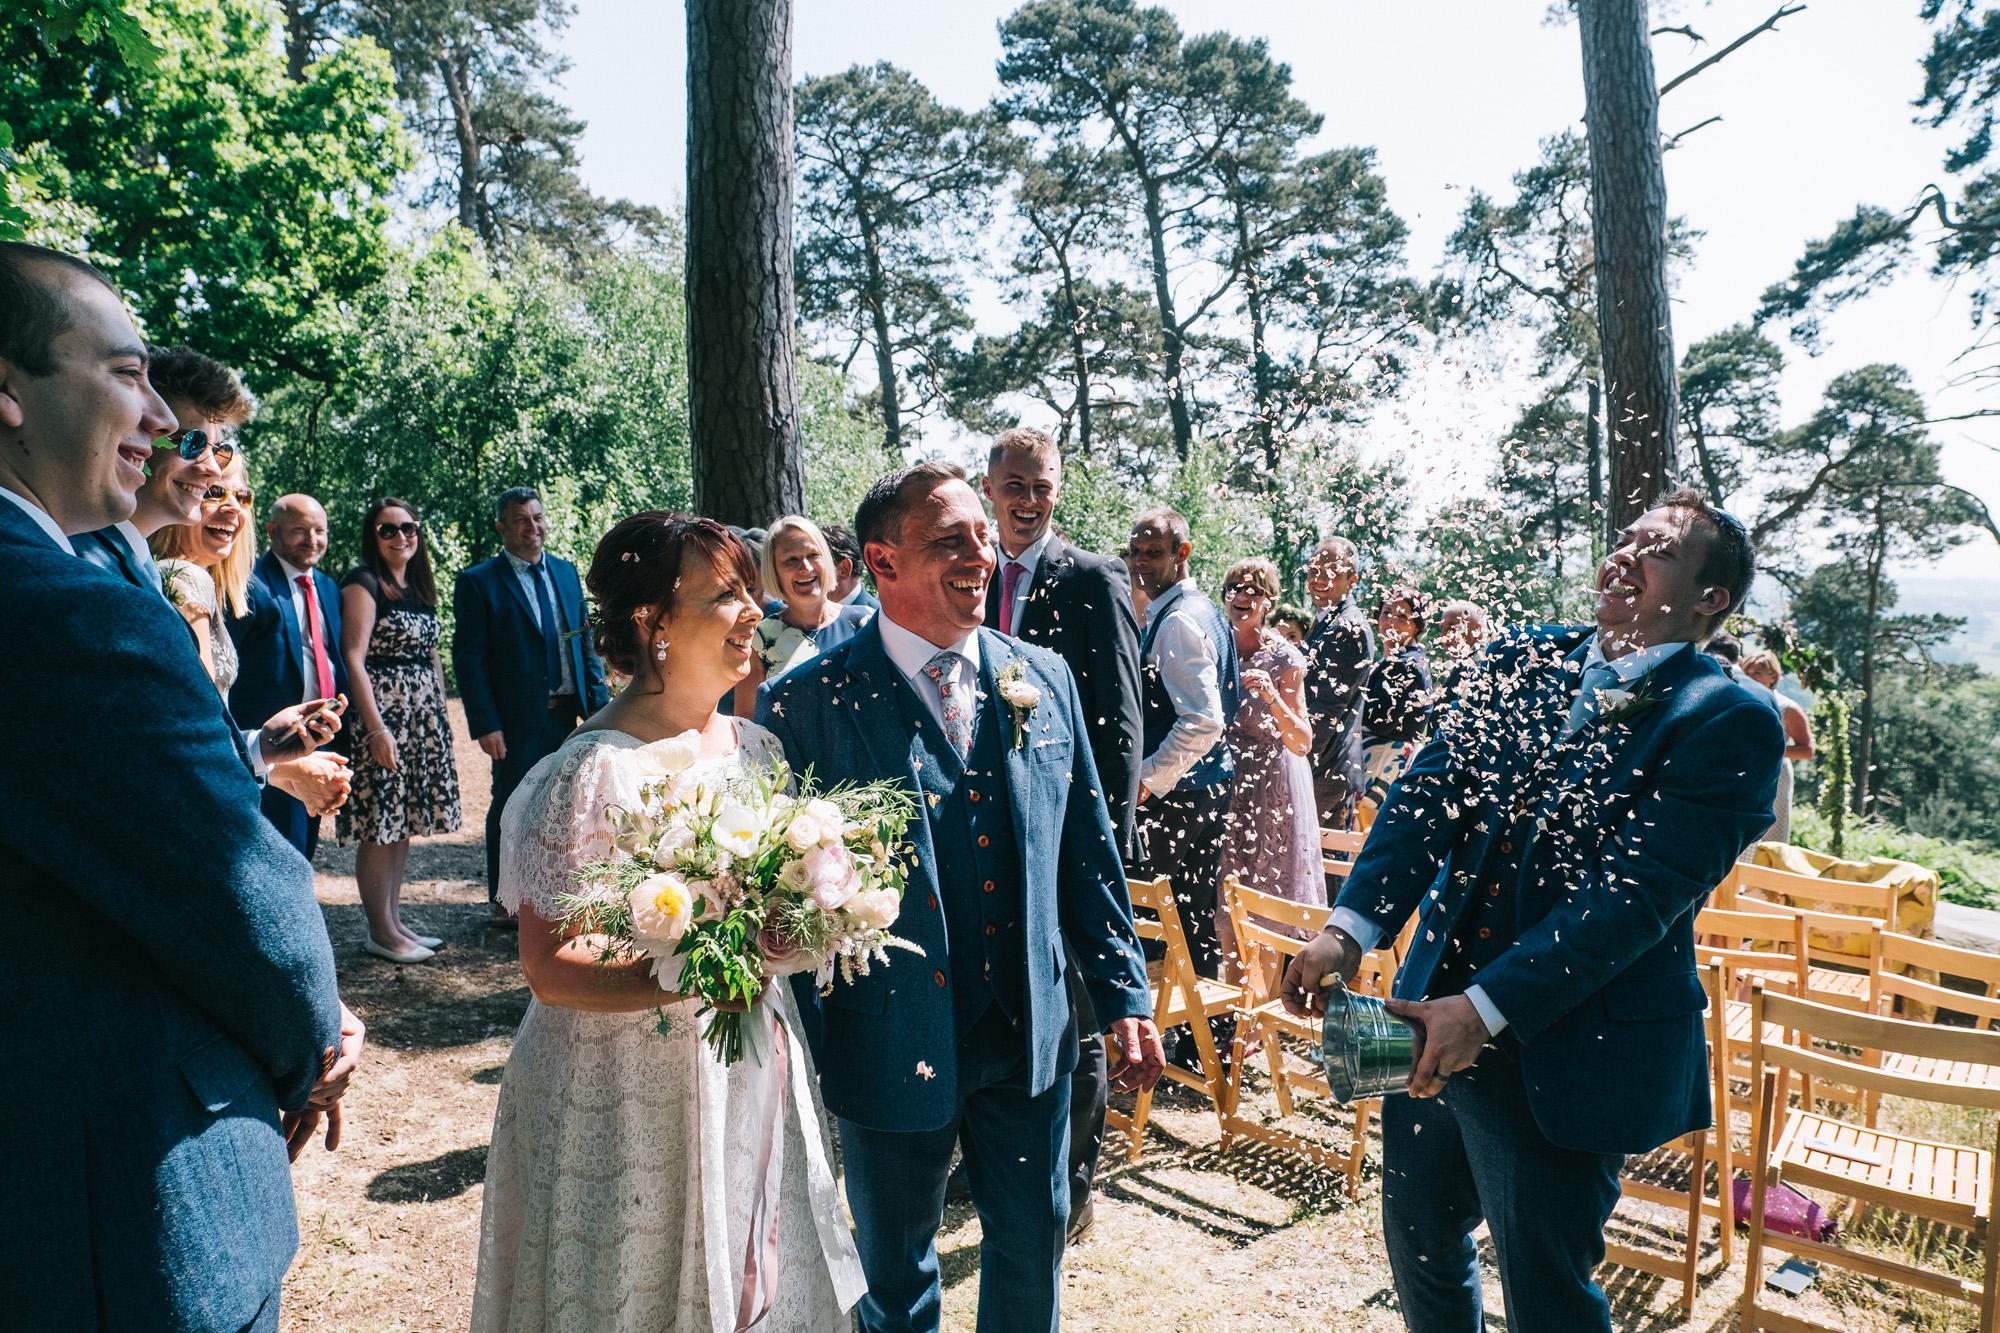 Bridgette-Dahlia-Blush-Silk-Lace-Wedding-Dress-Kate-Beaumont-Sheffield-Ivory-Fayre-10.jpg